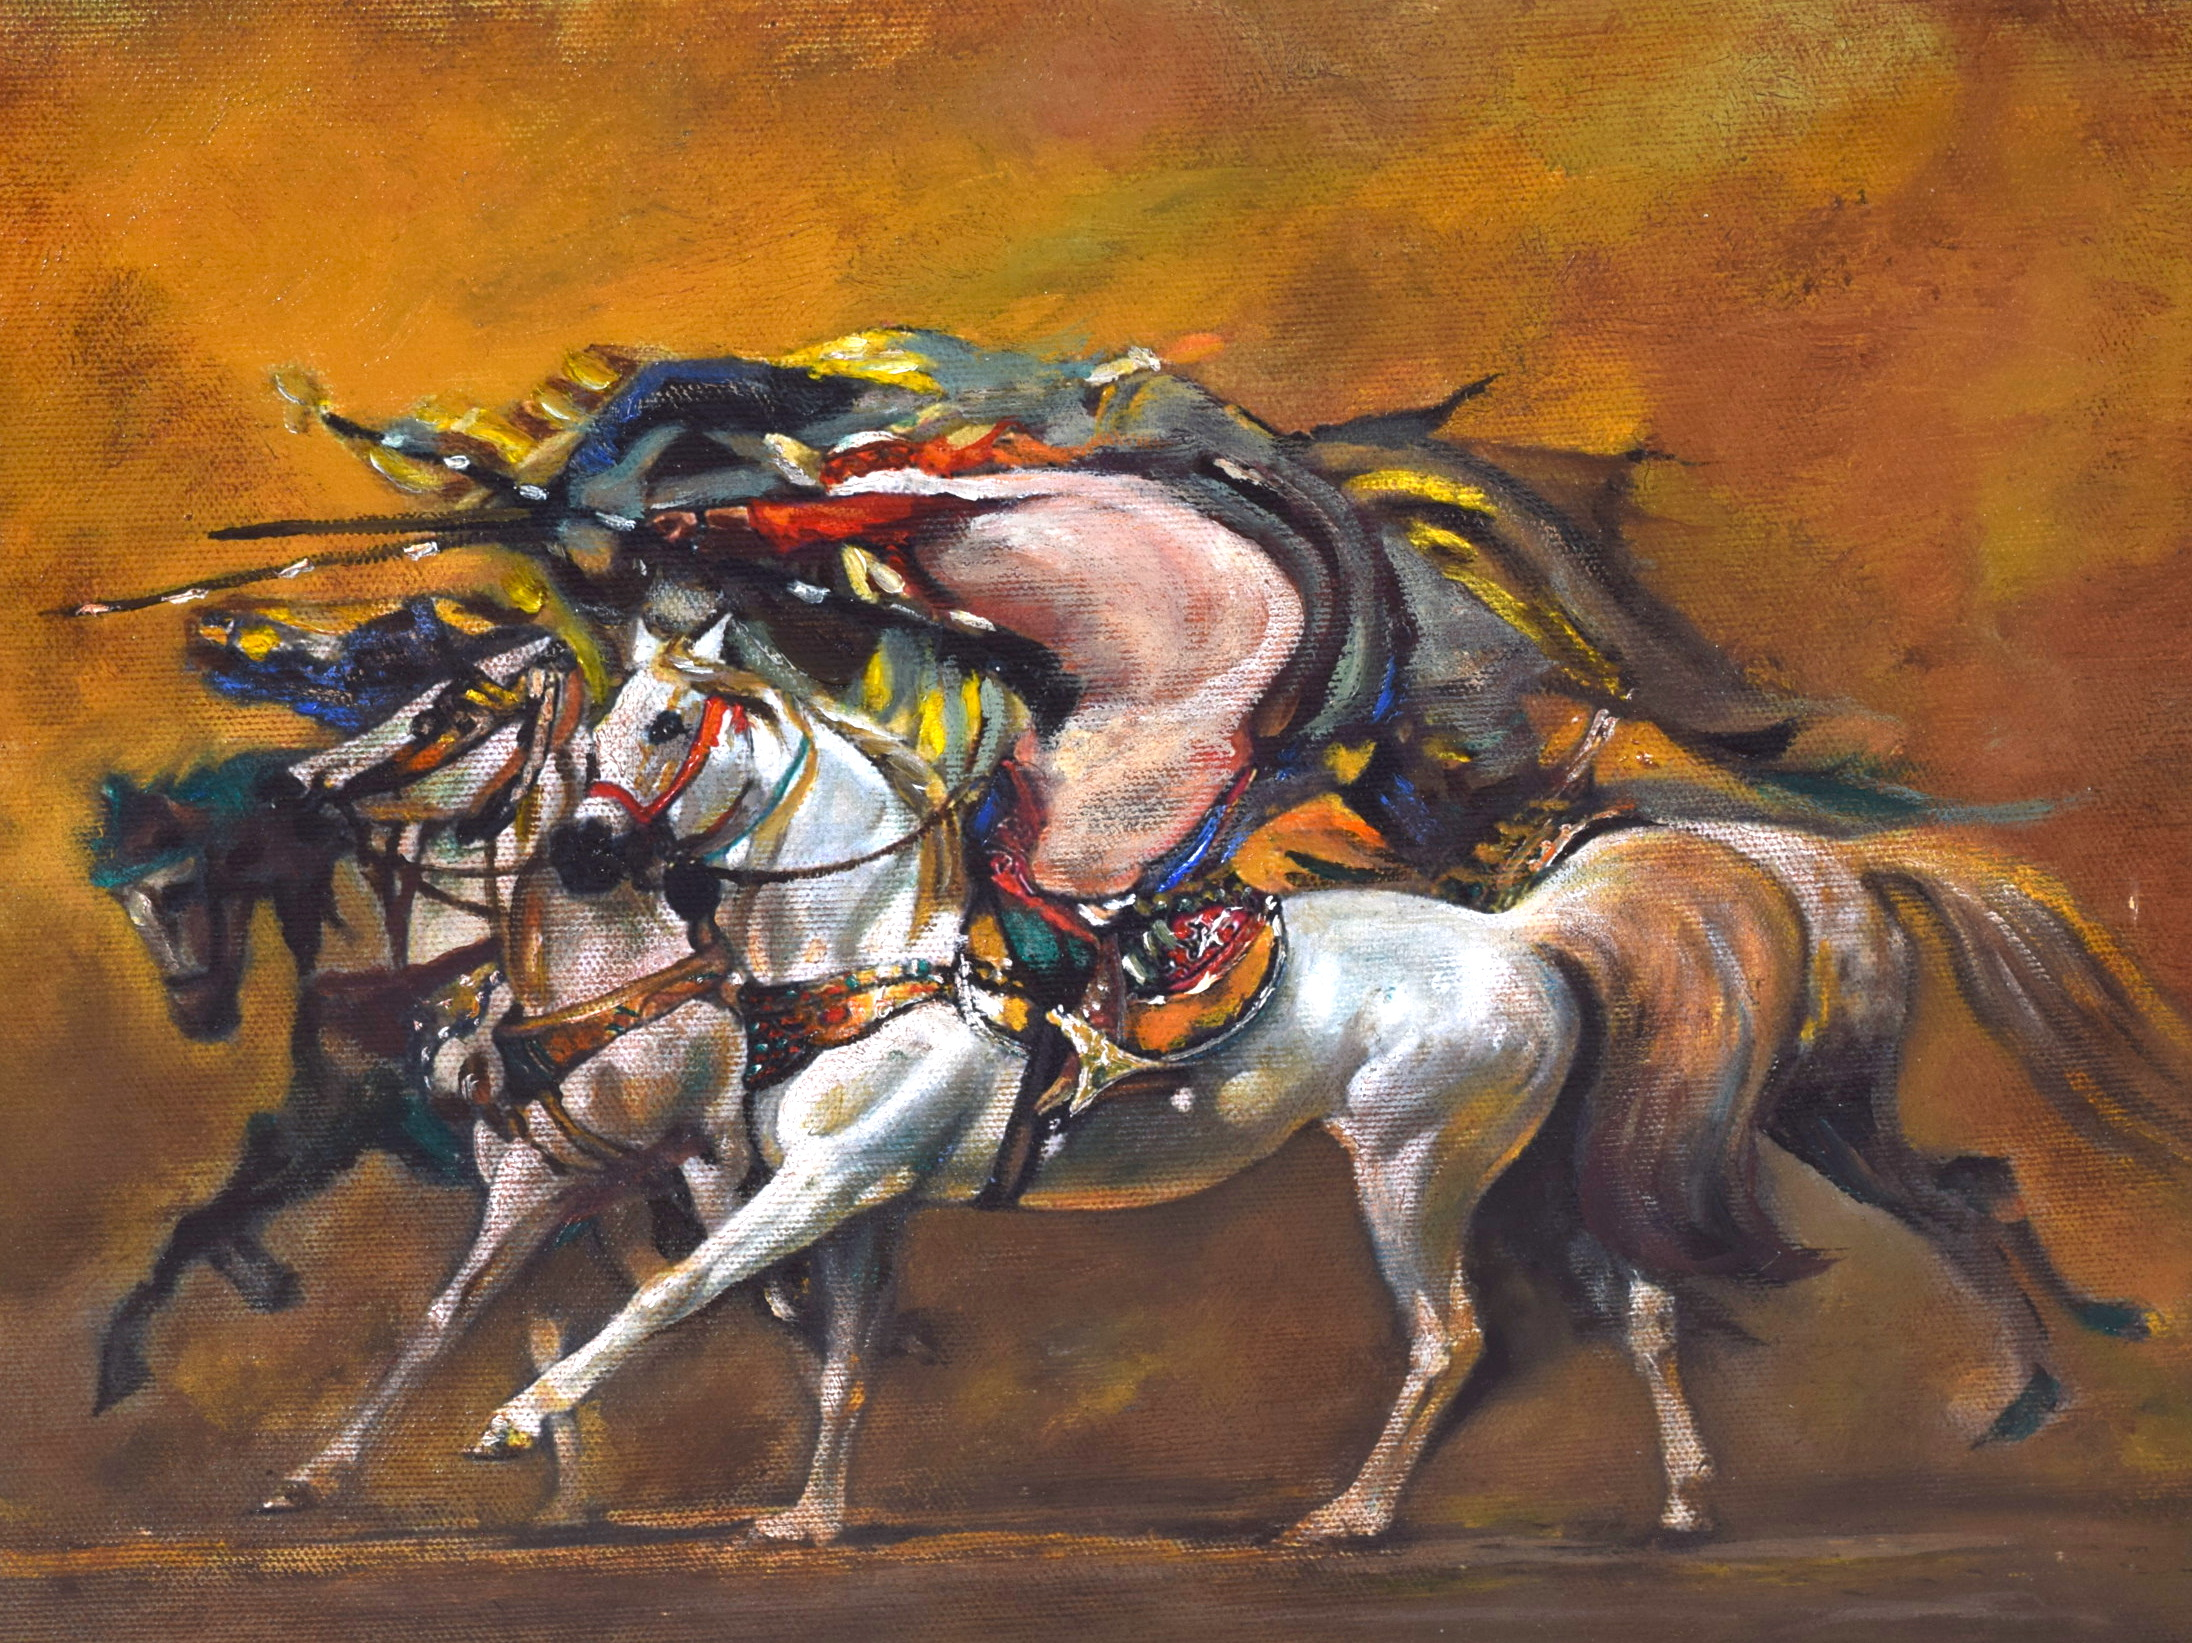 Lot 2217 - ARABIC SCHOOL (20th century) FRAMED OIL ON CANVAS, figures charging on horseback. 27 cm x 33.5 cm.